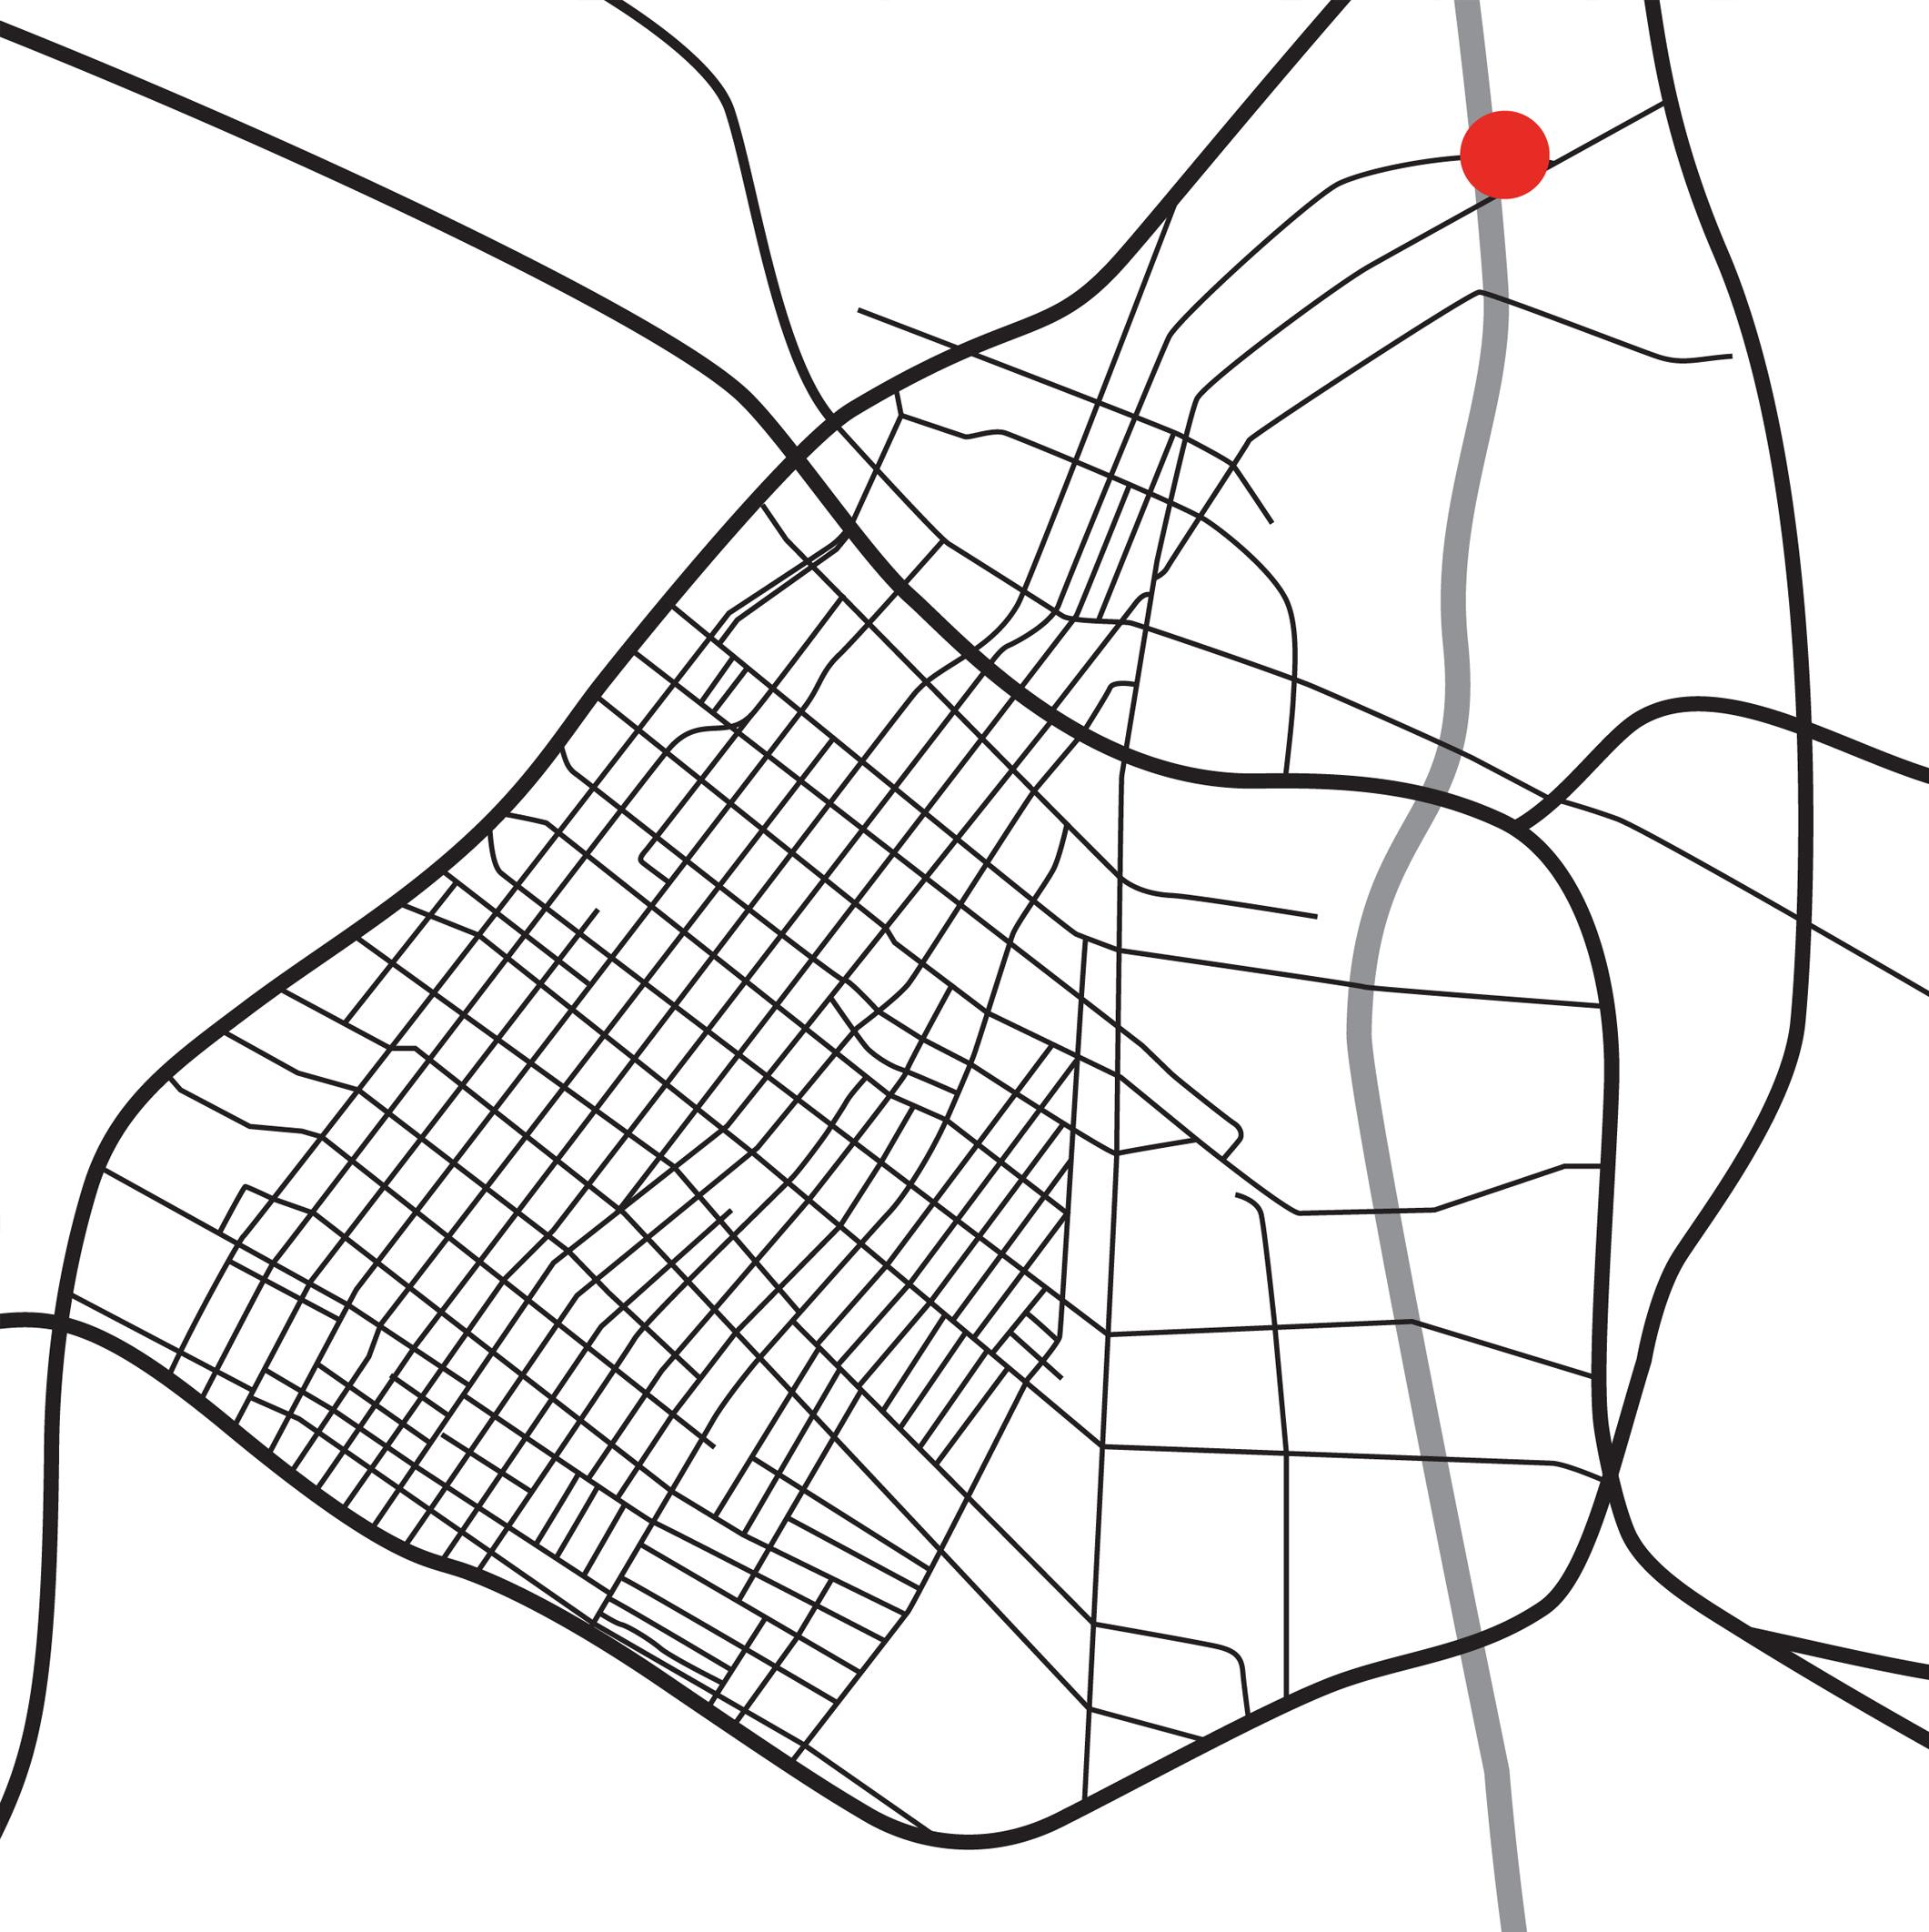 DTLA_MAP_BROADWAY BRIDGE VIEWPOINT.jpg